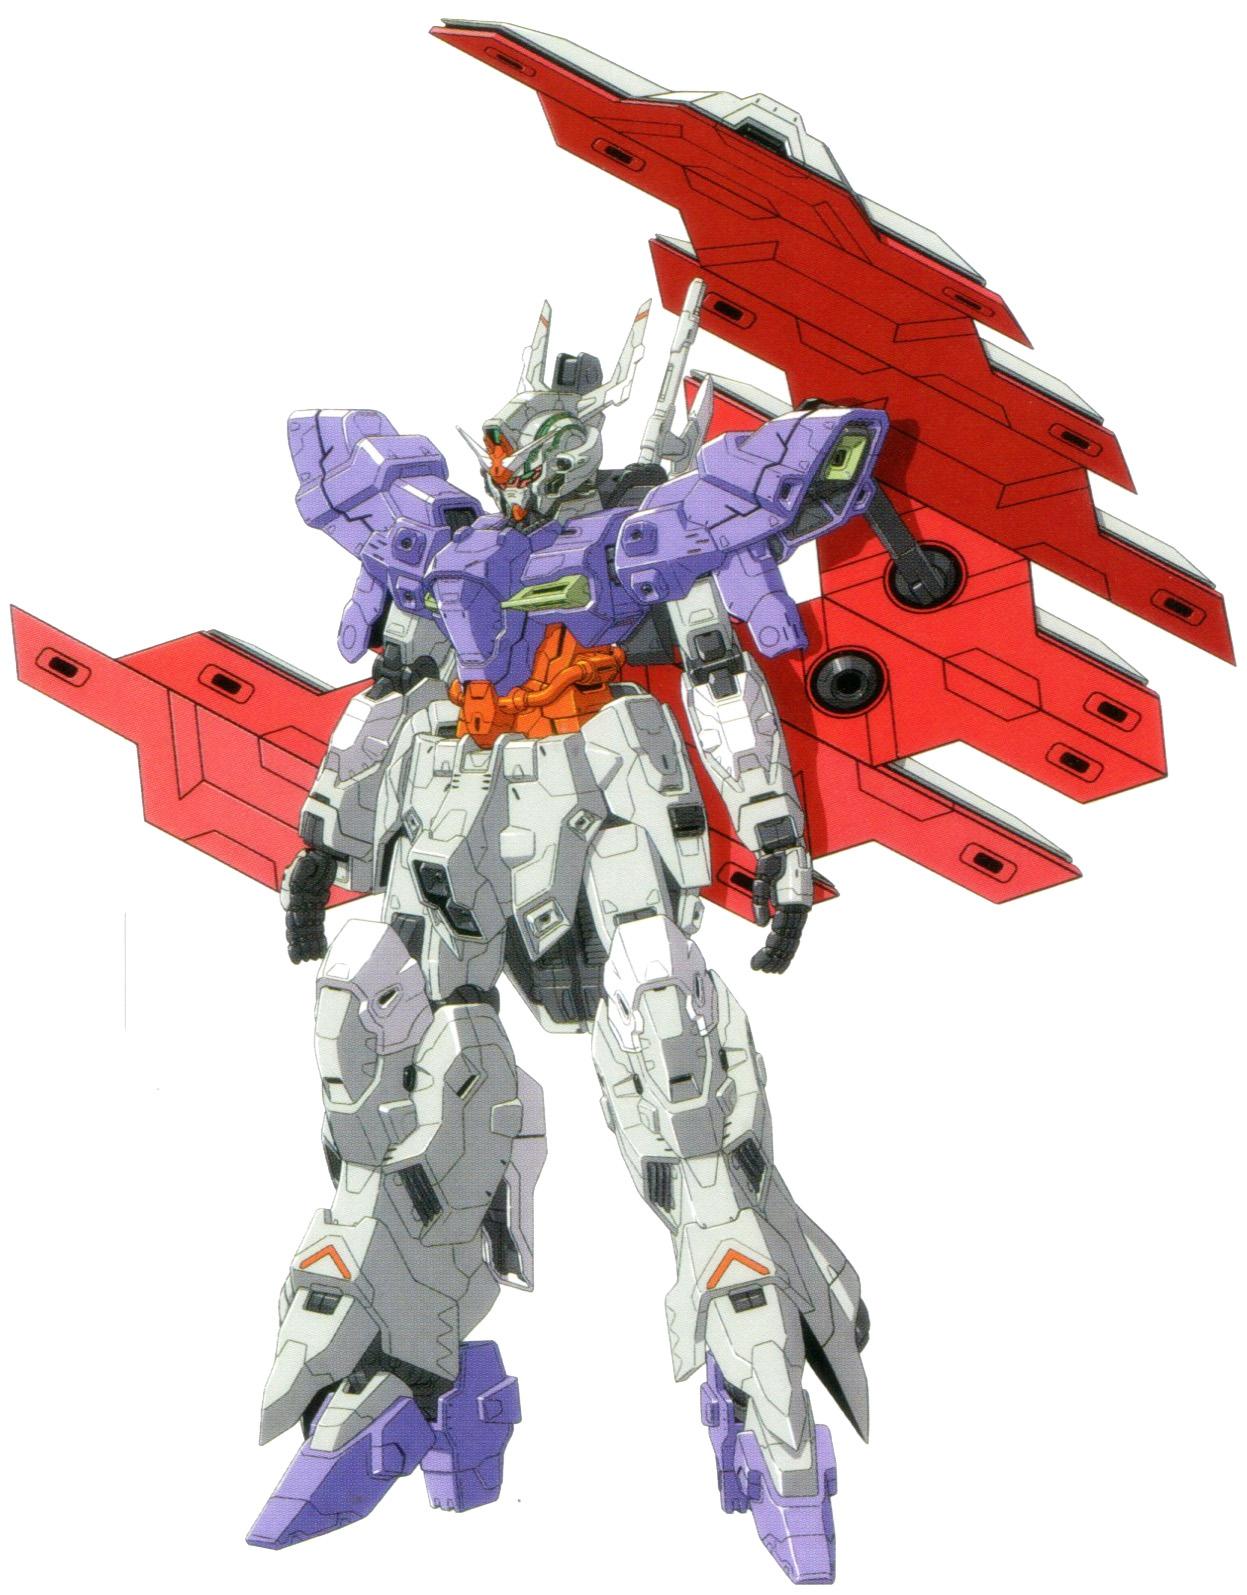 Ams 123x X Moon Gundam The Gundam Wiki Fandom For more gunpla (and pupper pics) follow me on instagram #gunpla #gundam #mobile suit gundam #plamo #moon gundam. ams 123x x moon gundam the gundam